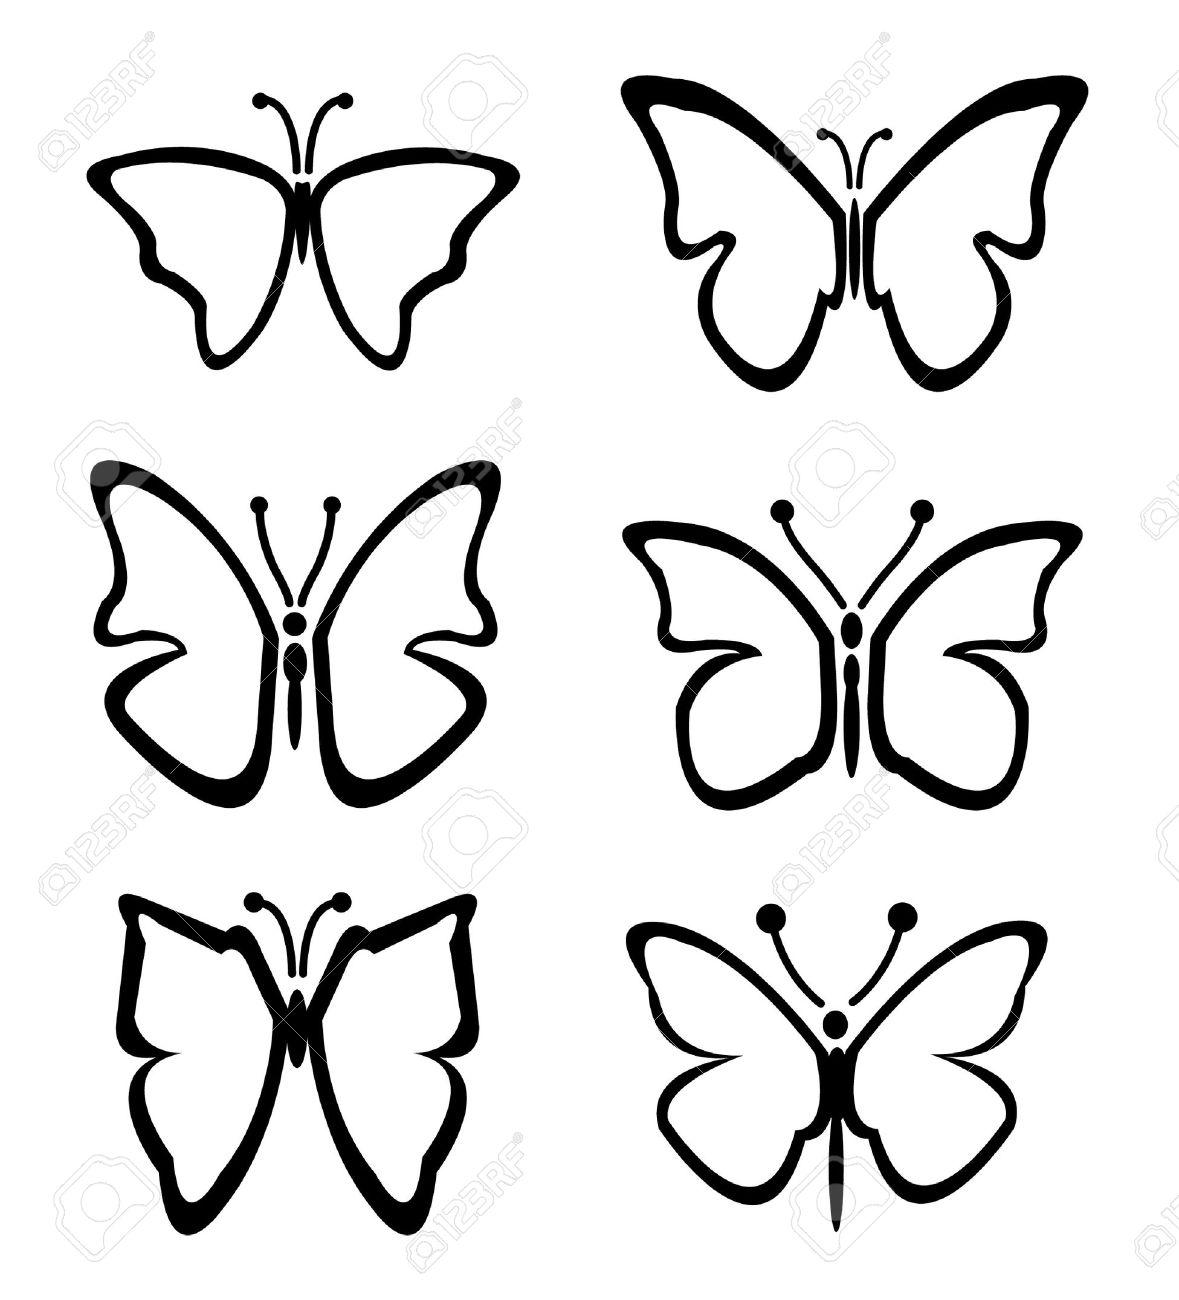 dessin papillon illustration ensemble de papillon illustration